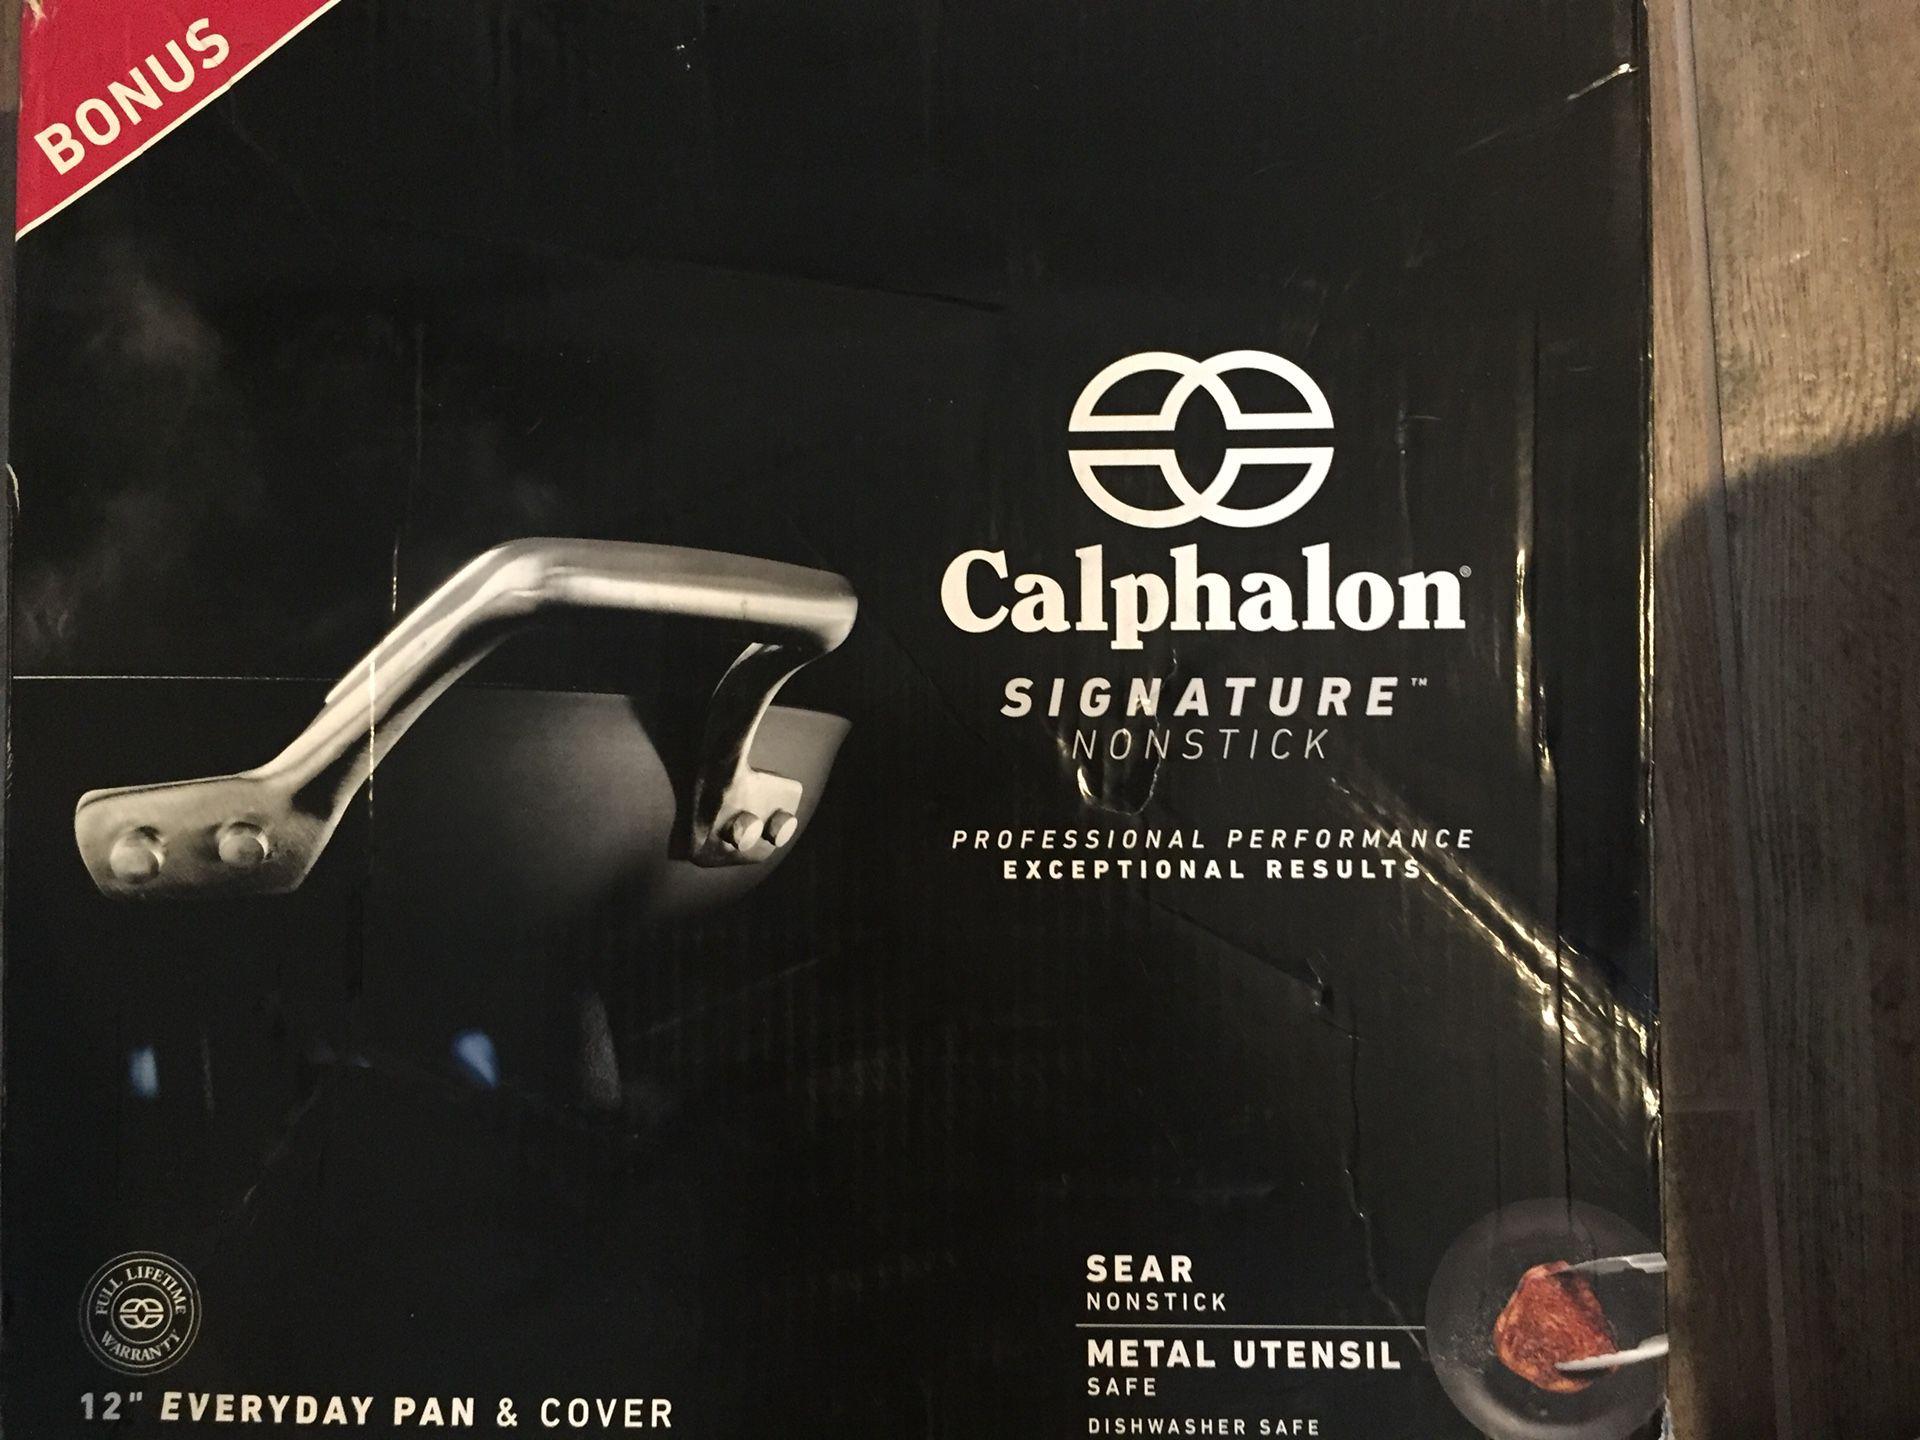 Calphalon hi end pan